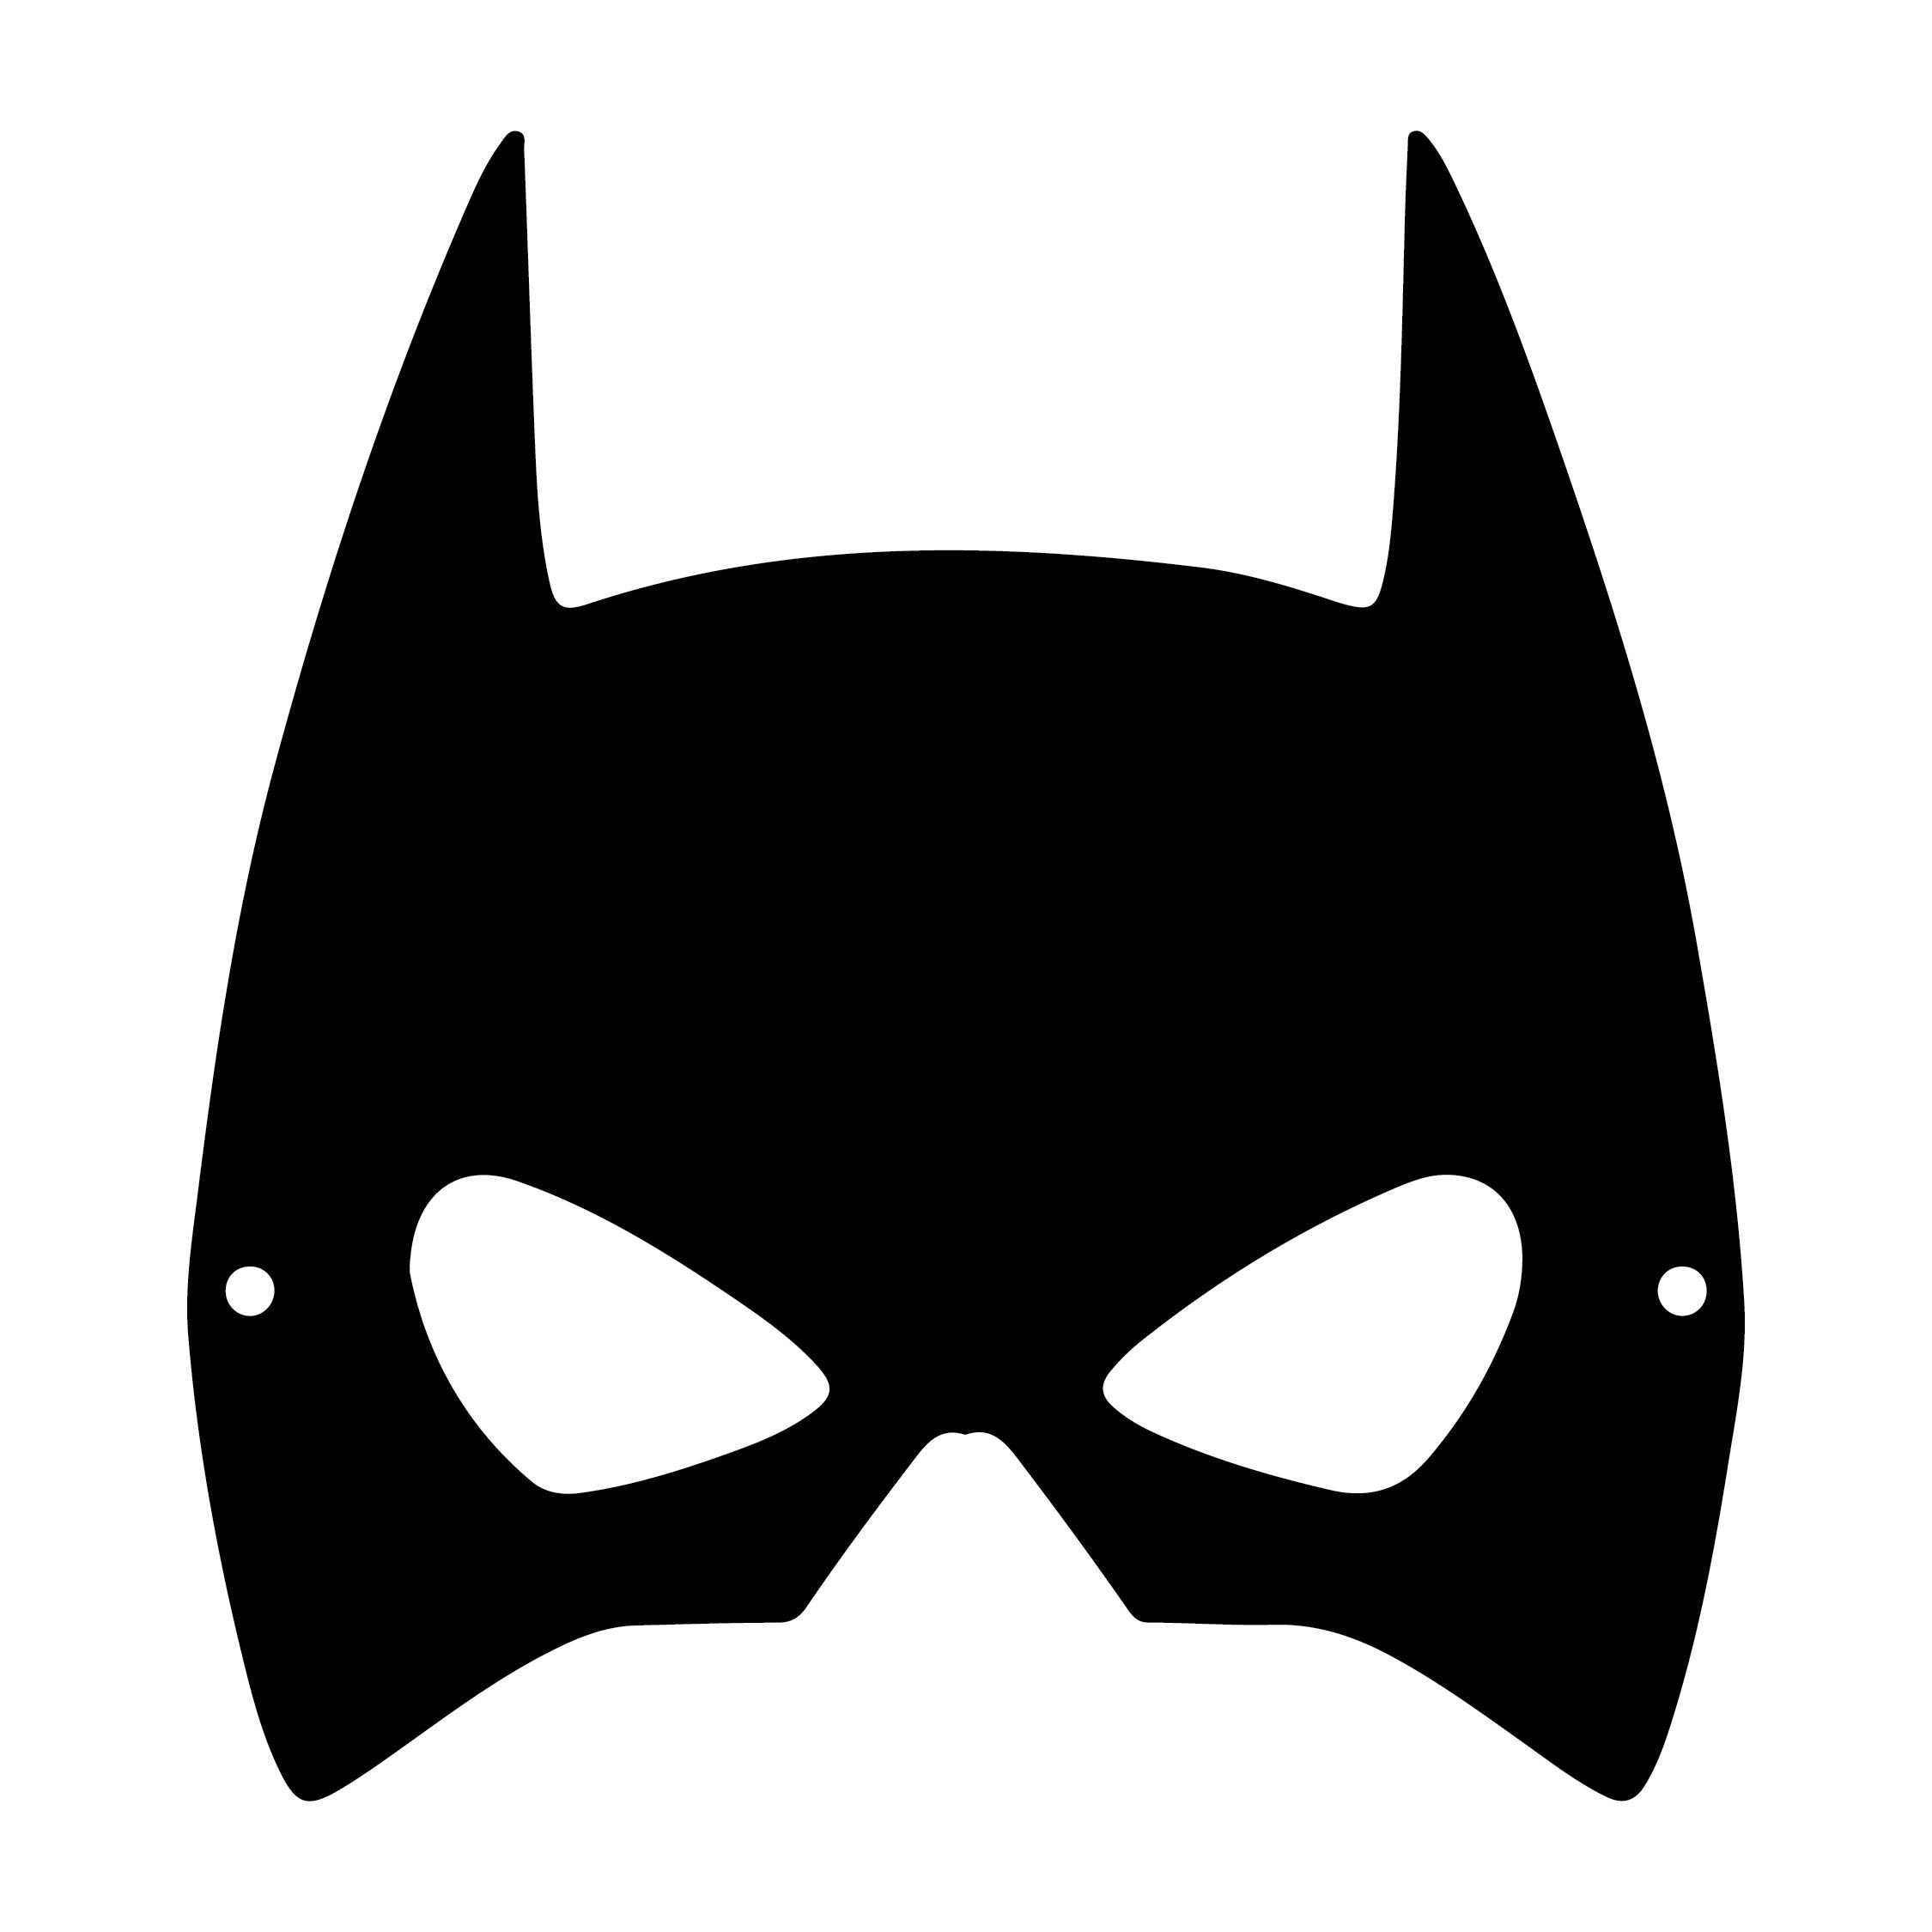 Halloween Bat Mask Template Printable